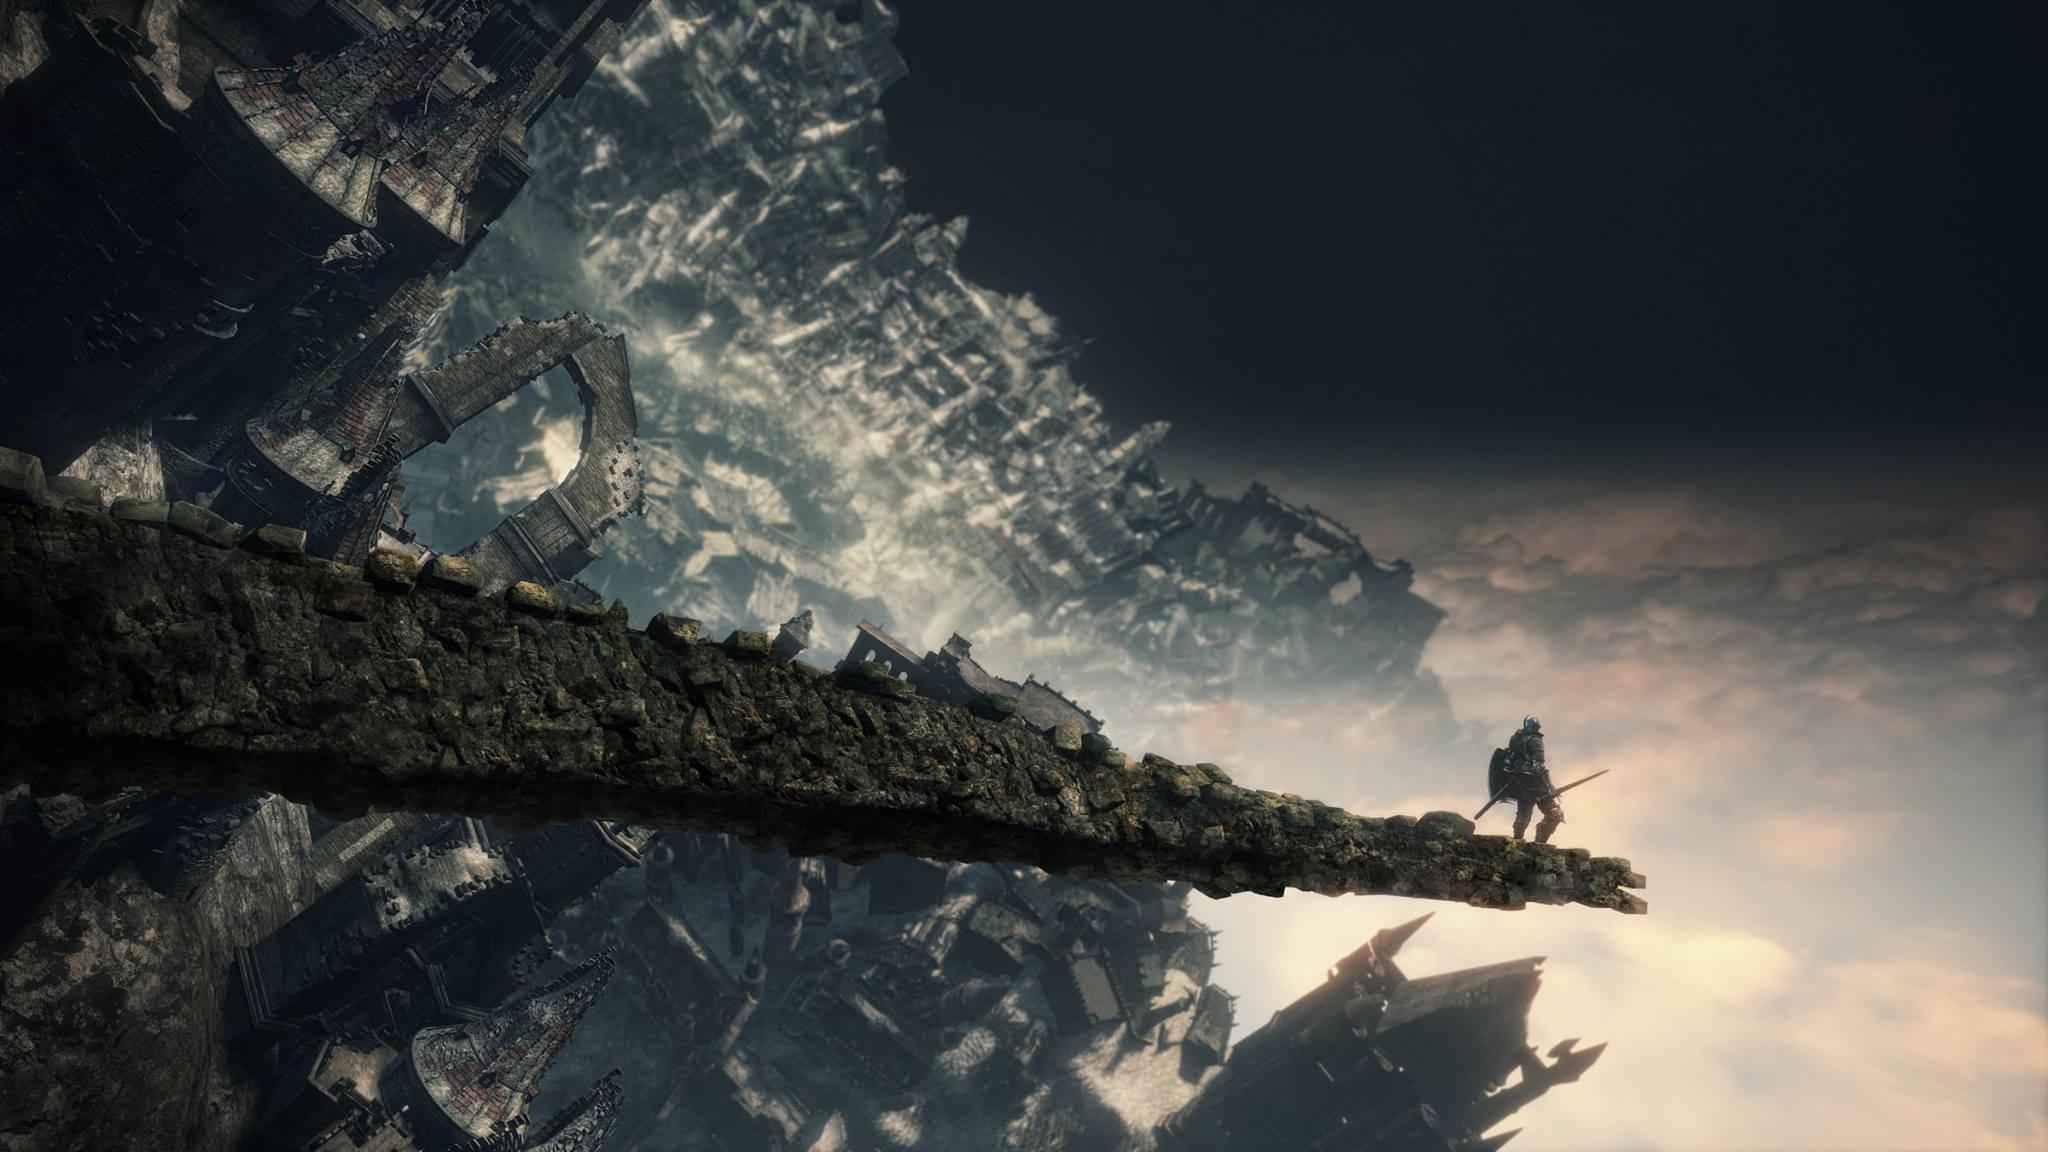 Dark Knight Falls Wallpaper The Ringed City Dark Souls 3 Wiki